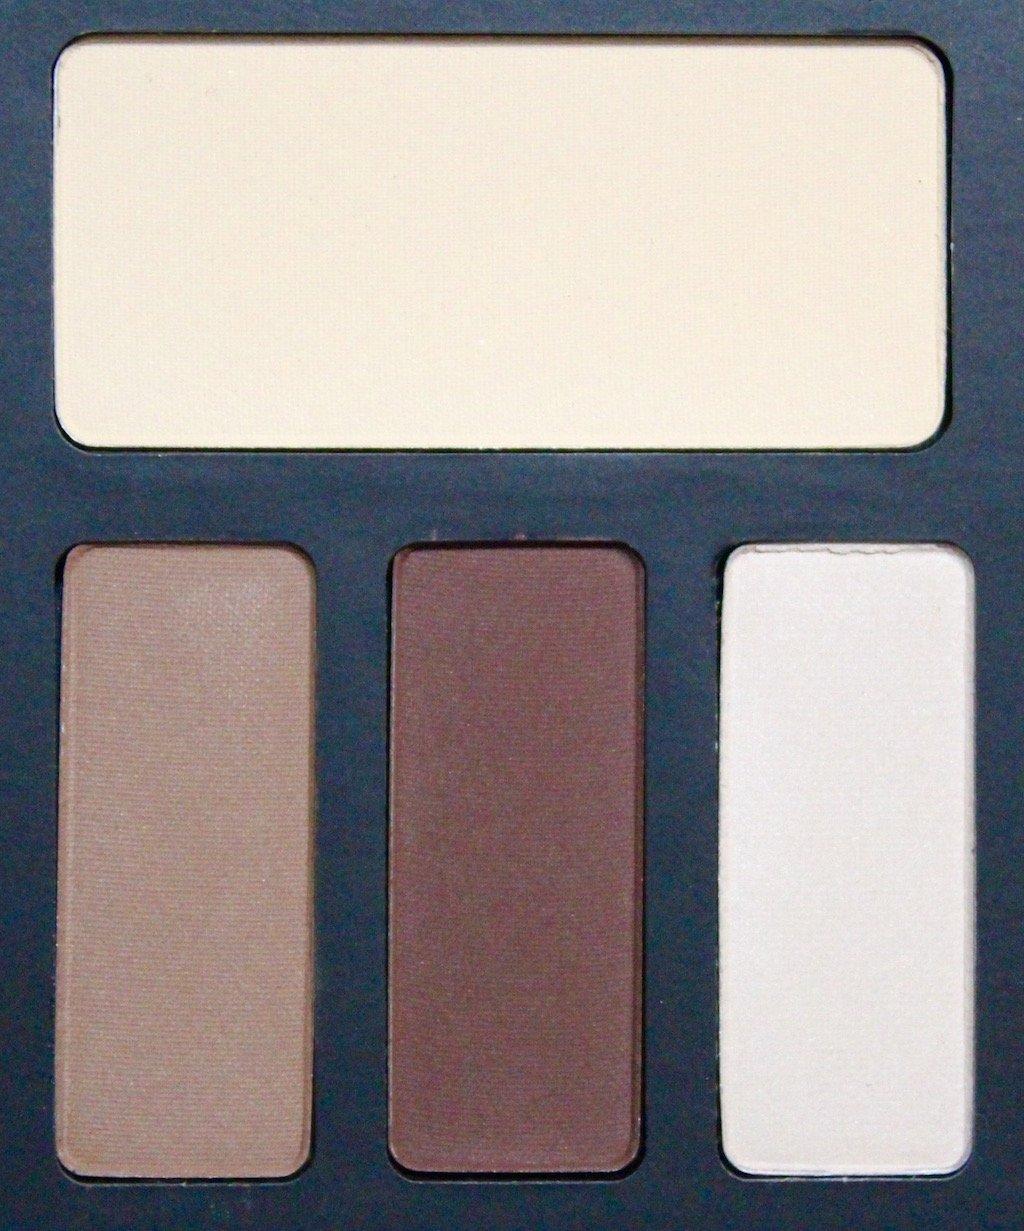 Kat Von D Shade Light Eye Contour Palette Amp Brush Review